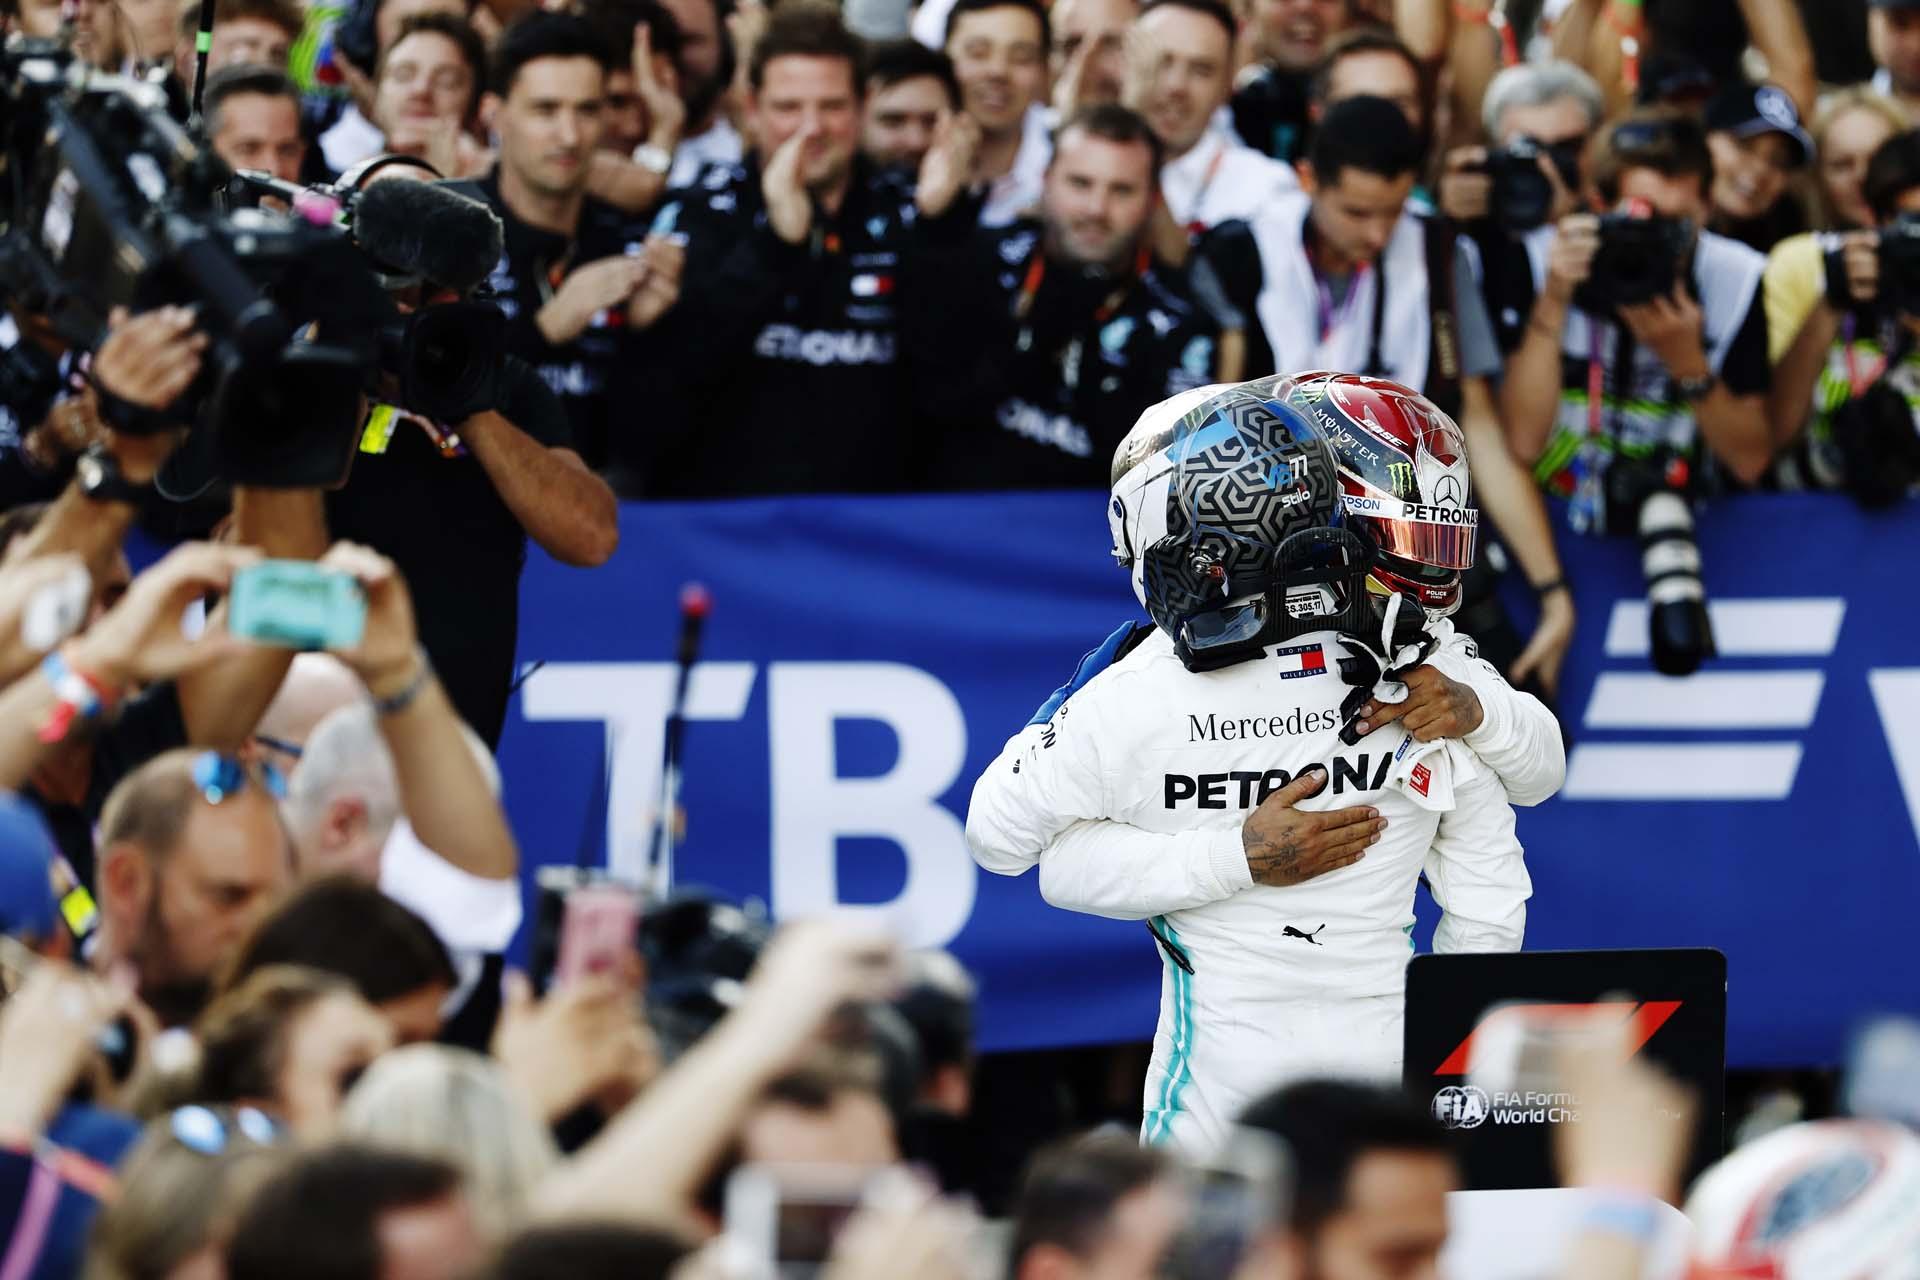 2019 Russian Grand Prix, Sunday - LAT Images